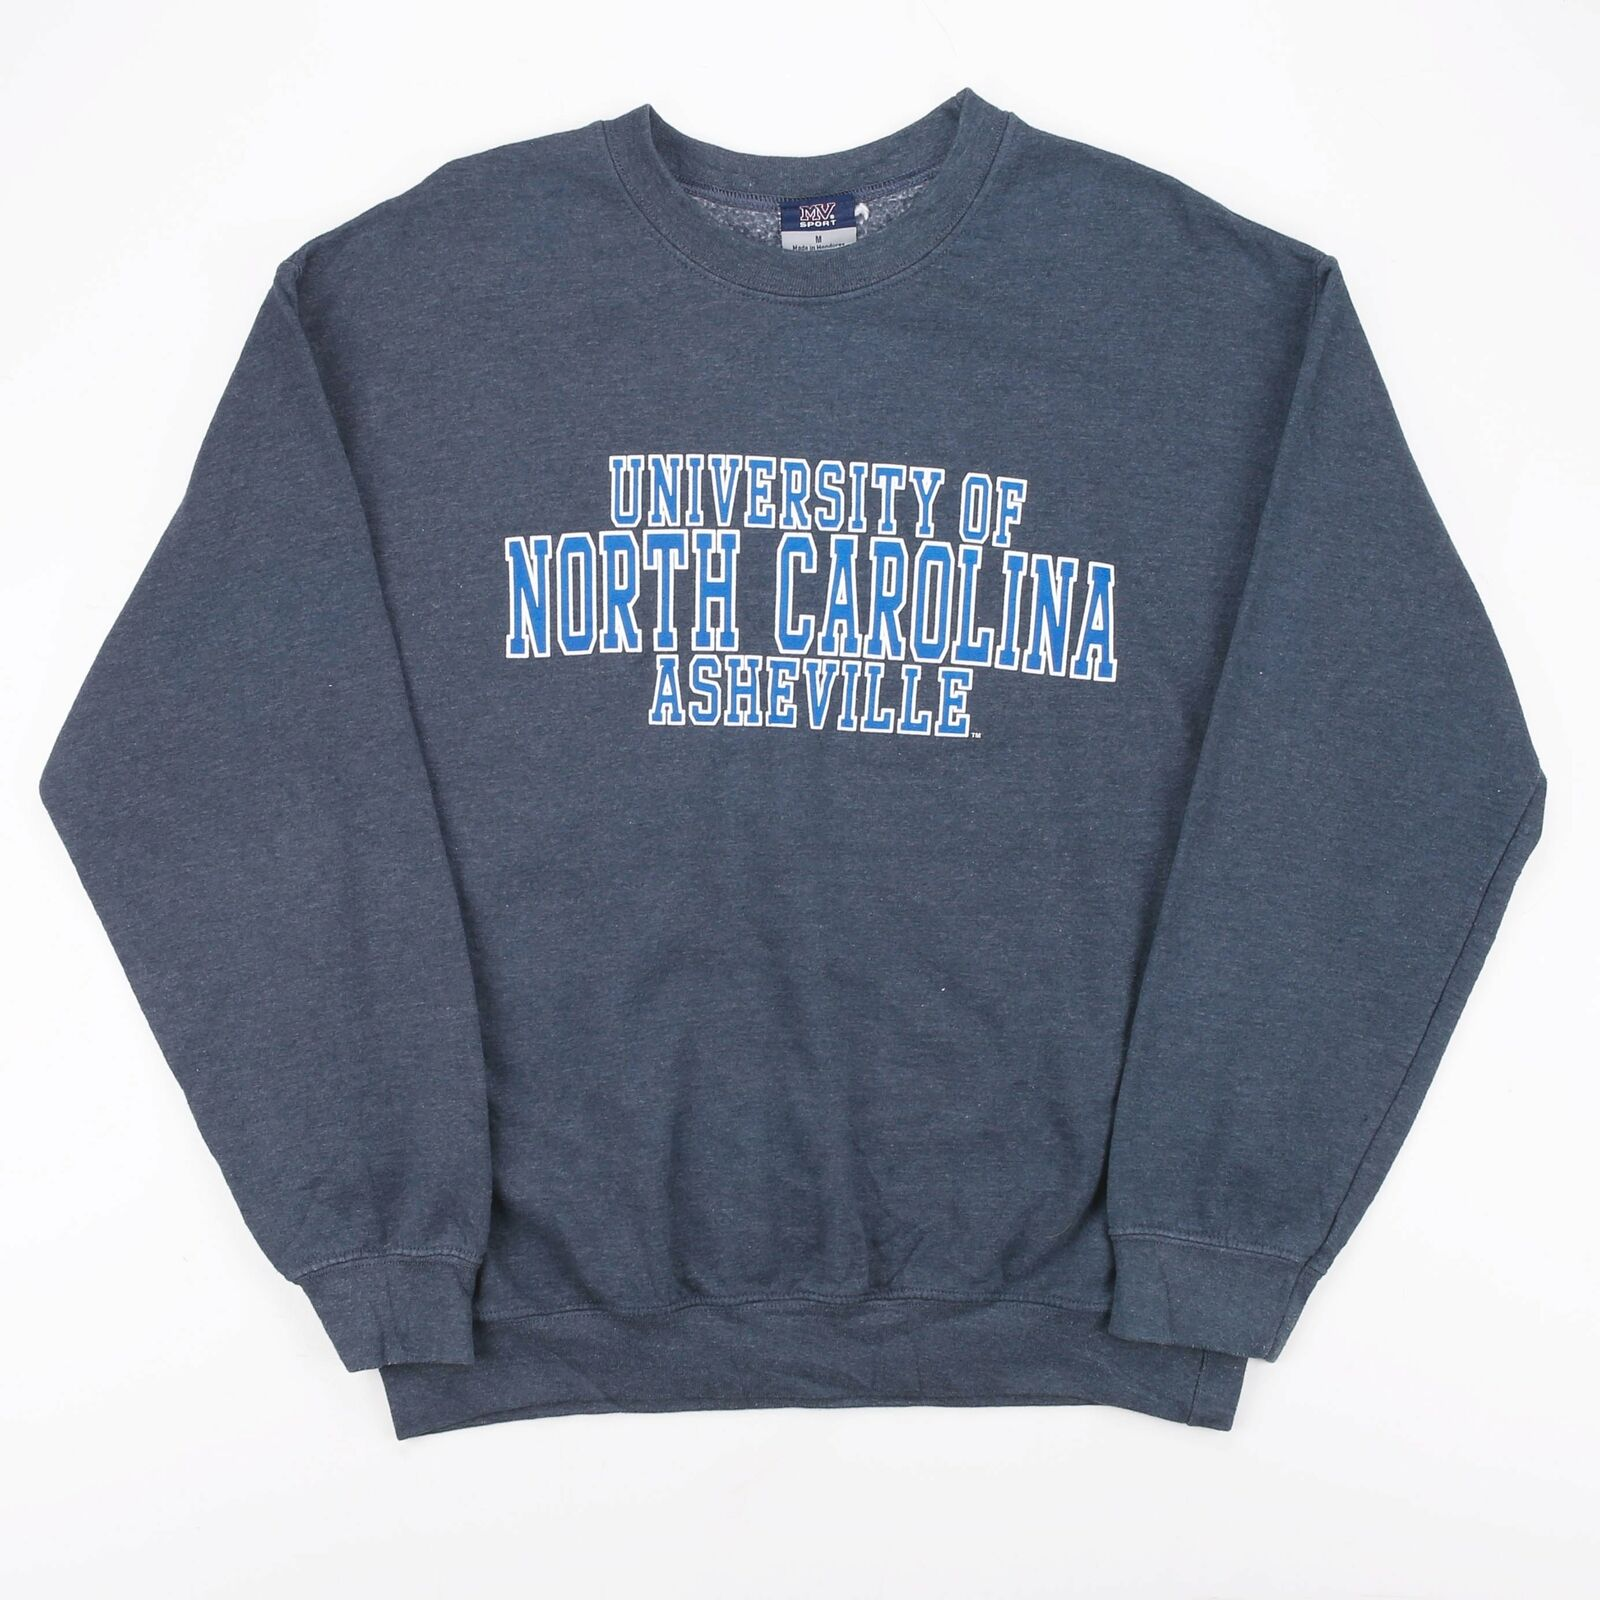 Vintage MV SPORTS NORTH CAROLINA Blue College Crew Neck Sweatshirt Mens M